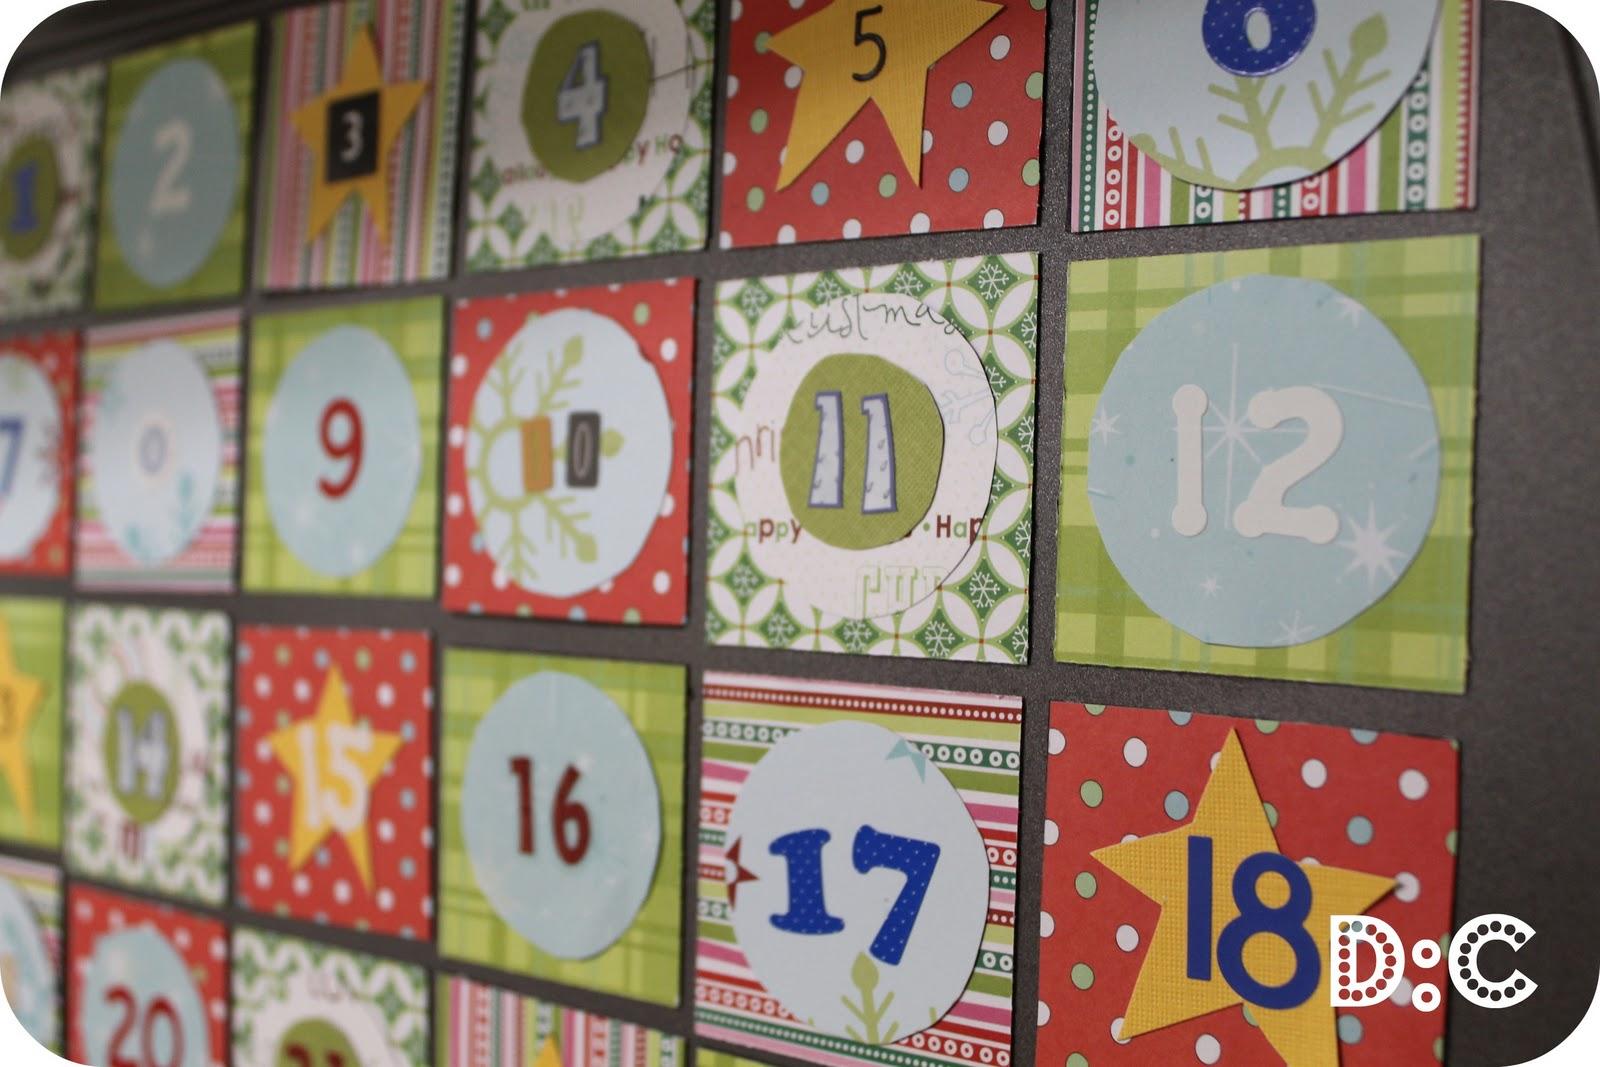 Ideas For Advent Calendar Gifts : Destination craft advent calendar ideas